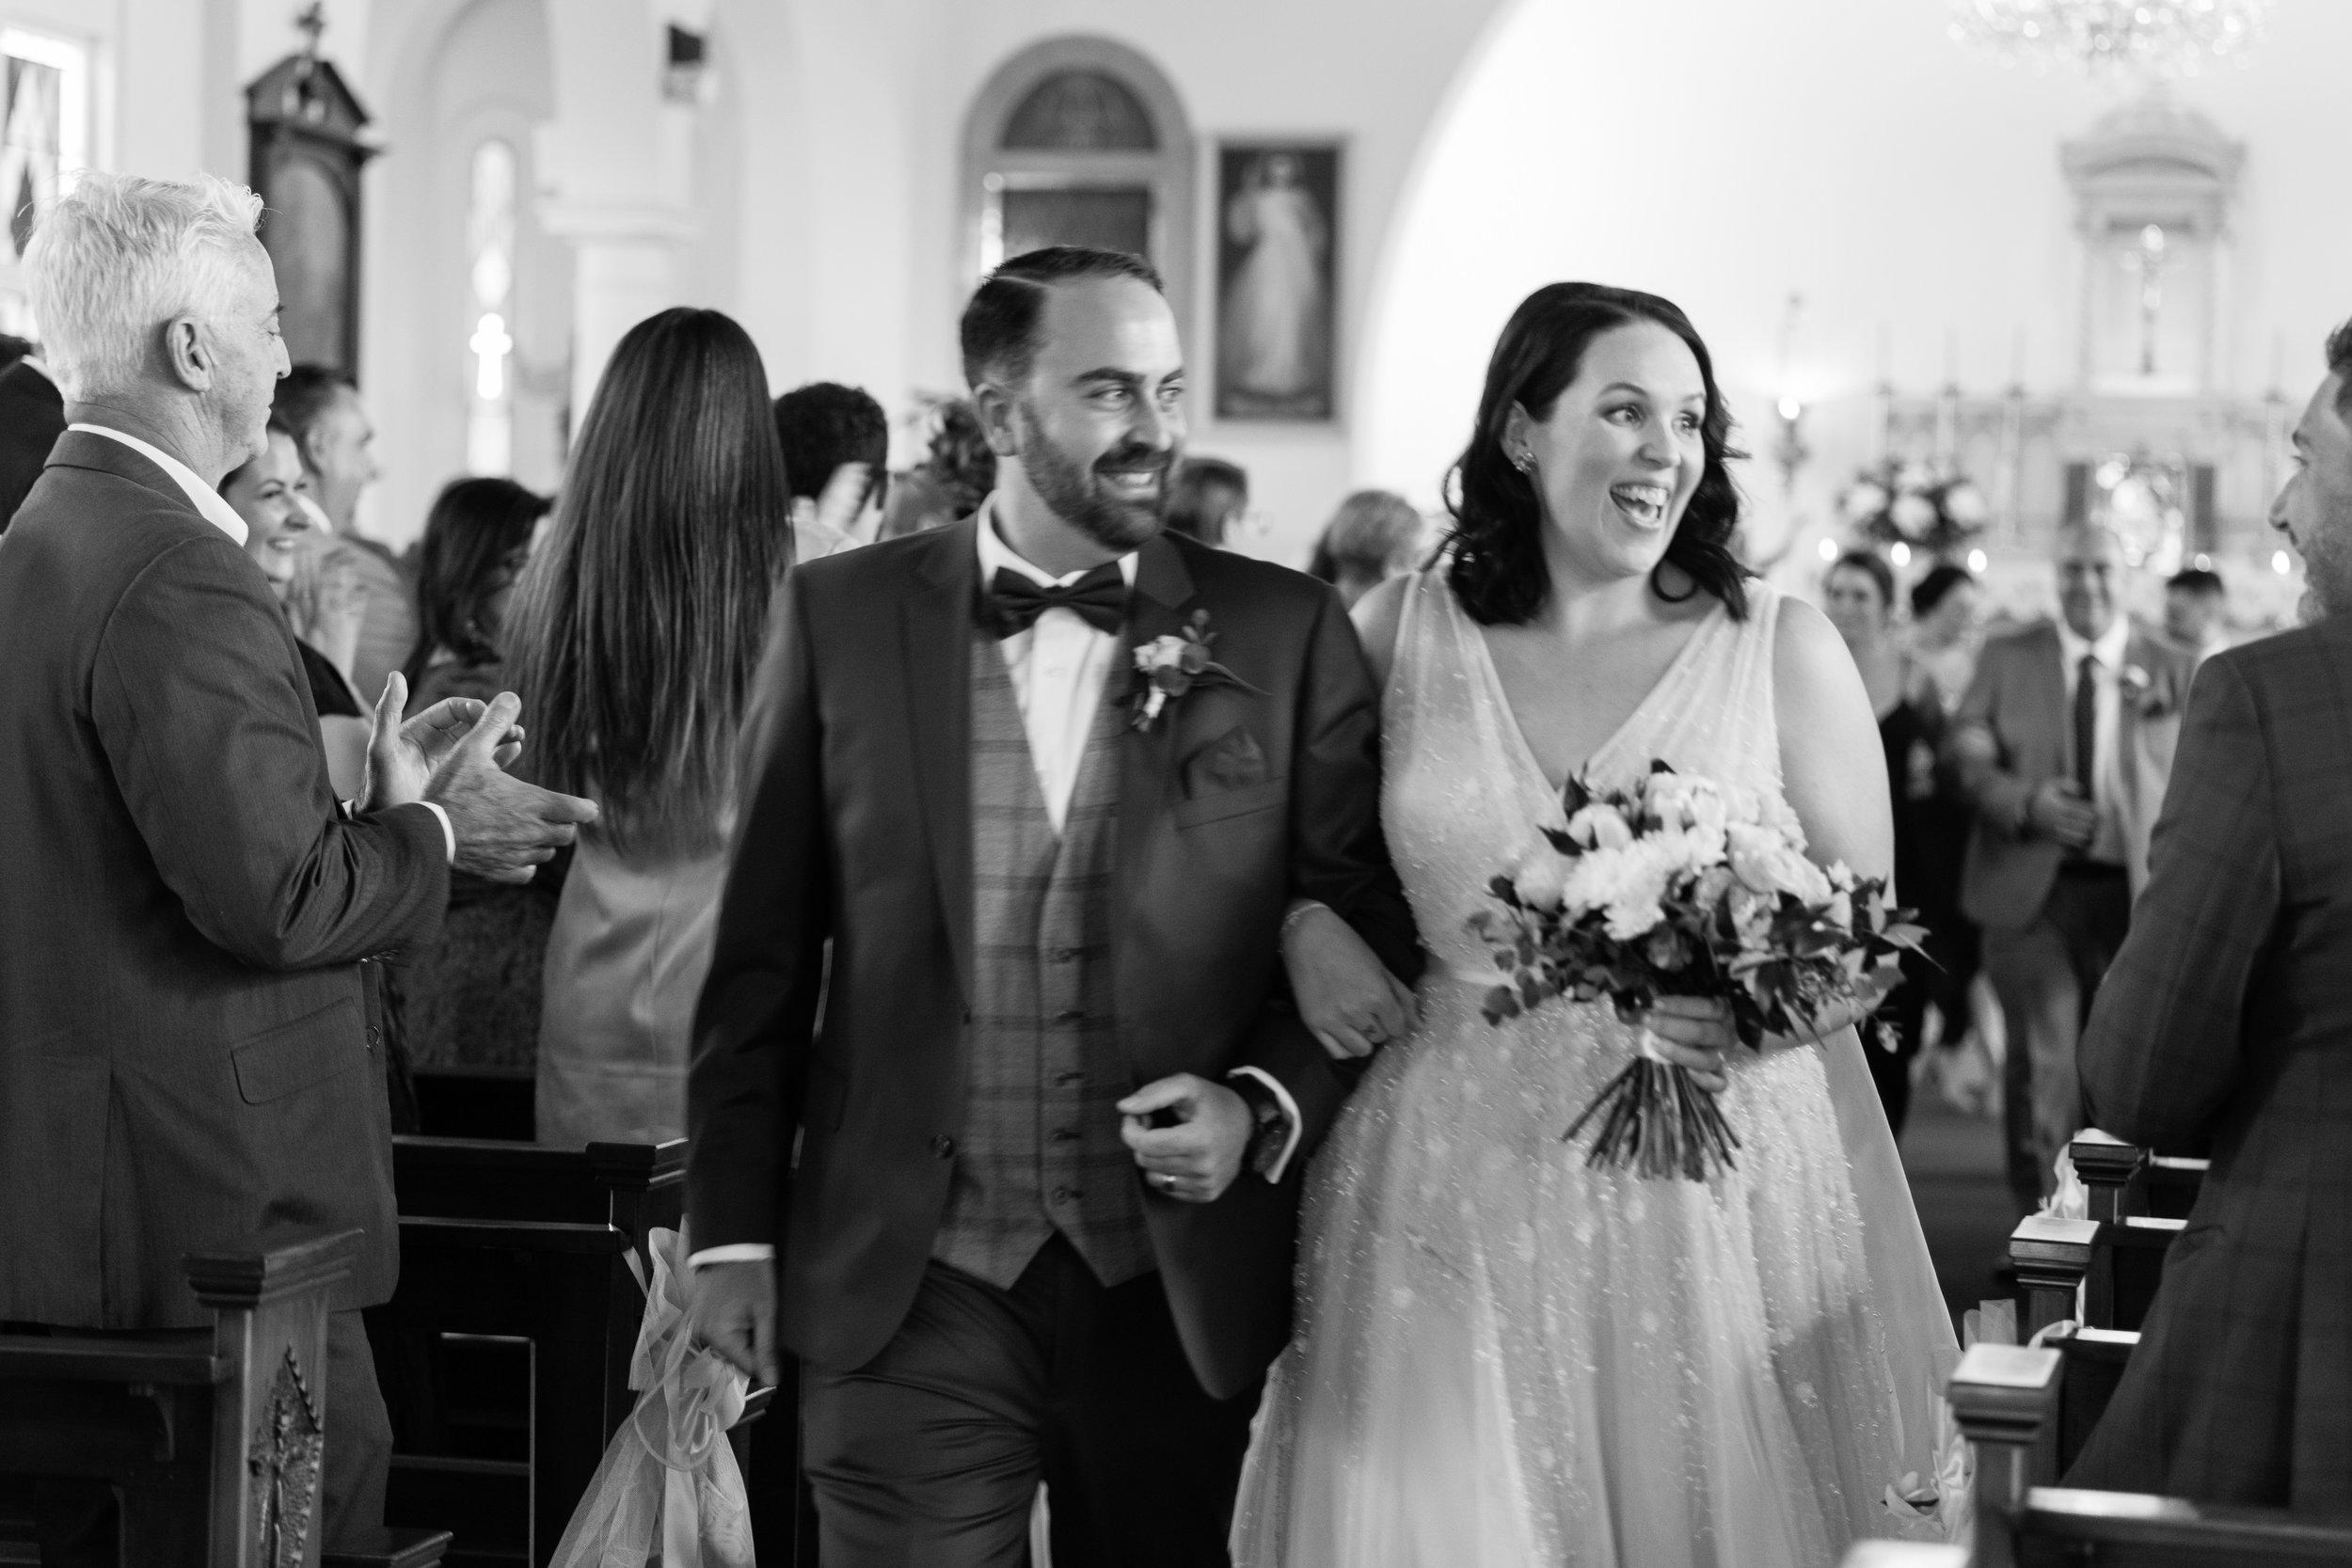 brisbane-city-wedding-photographer-romantic-wedding-39.jpg